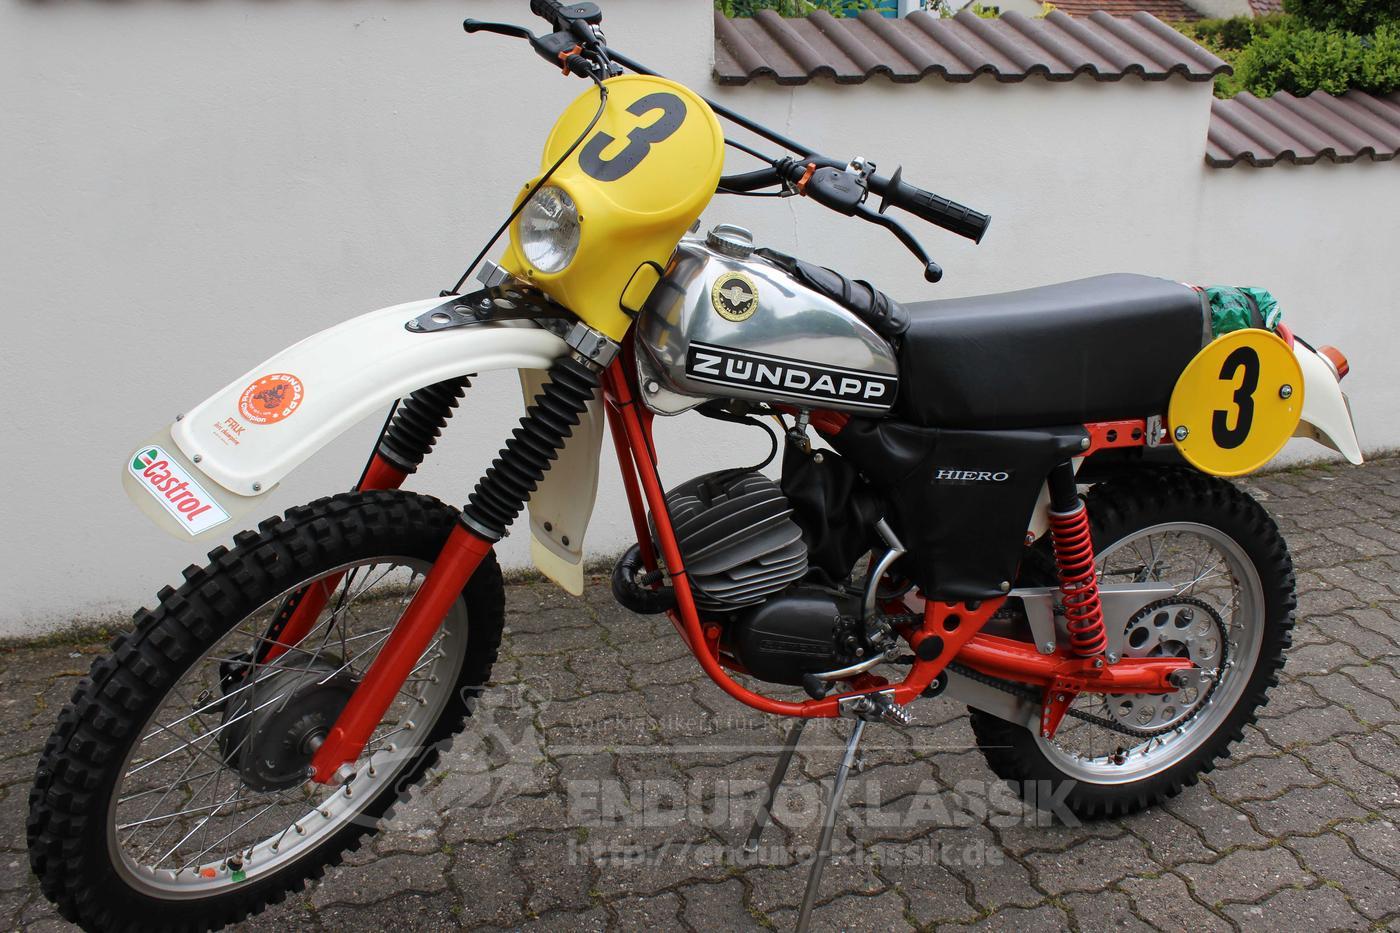 Suzuki Ks